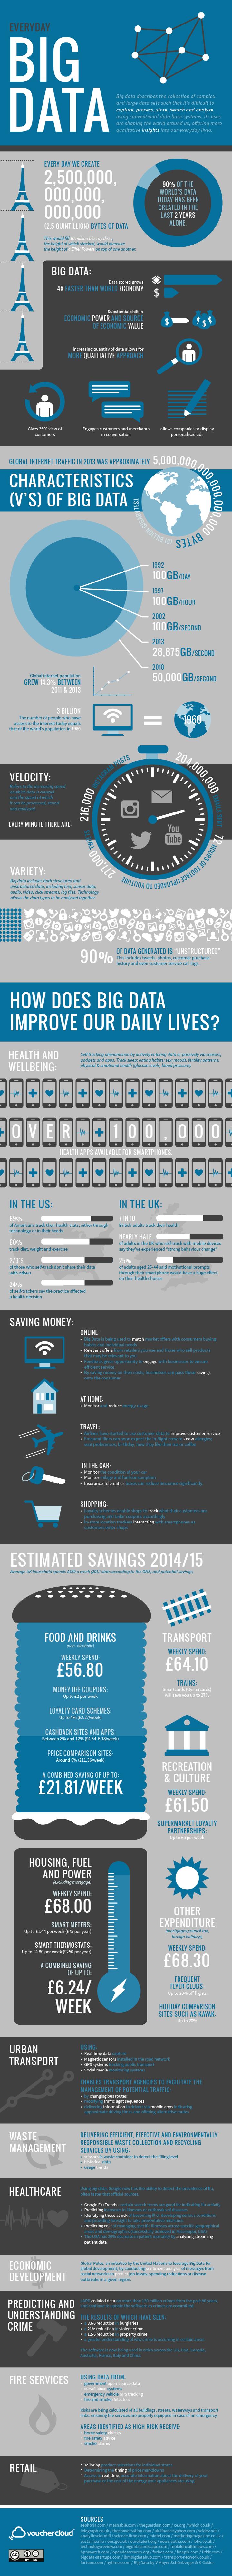 Everyday Big Data Infographic